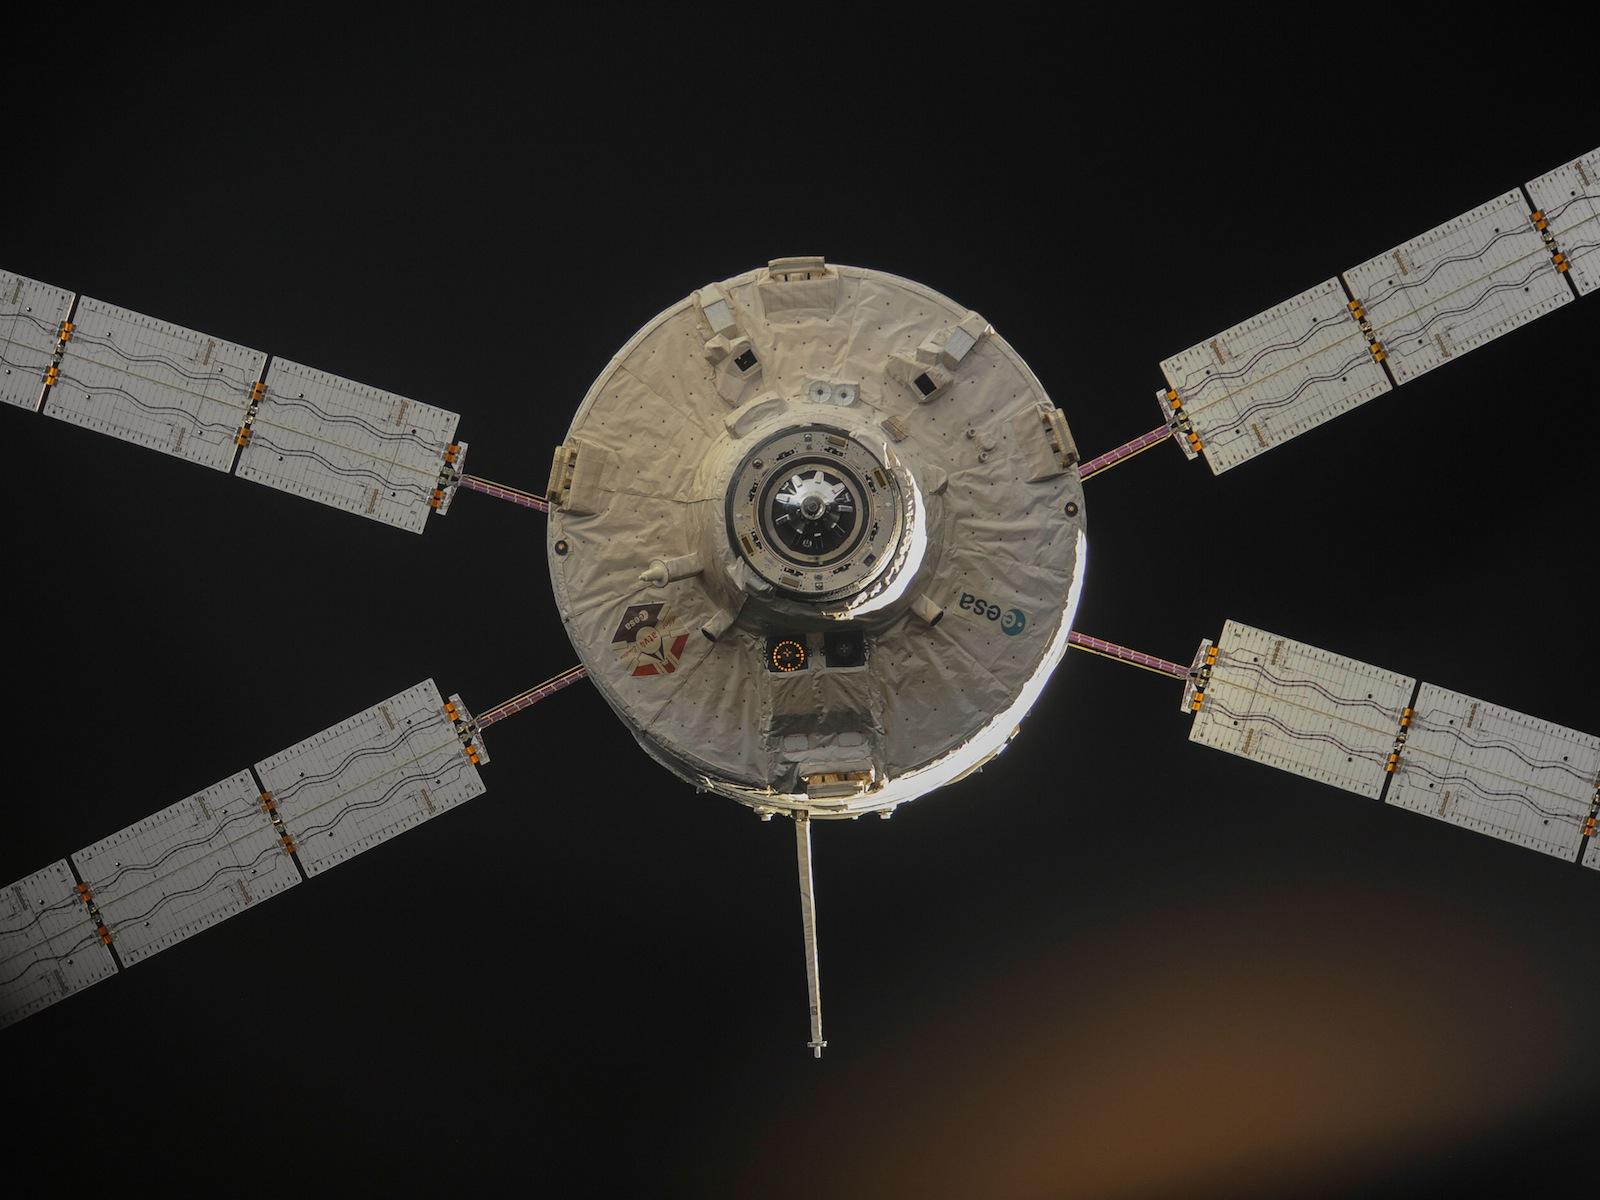 ATV-4 Undocks from ISS